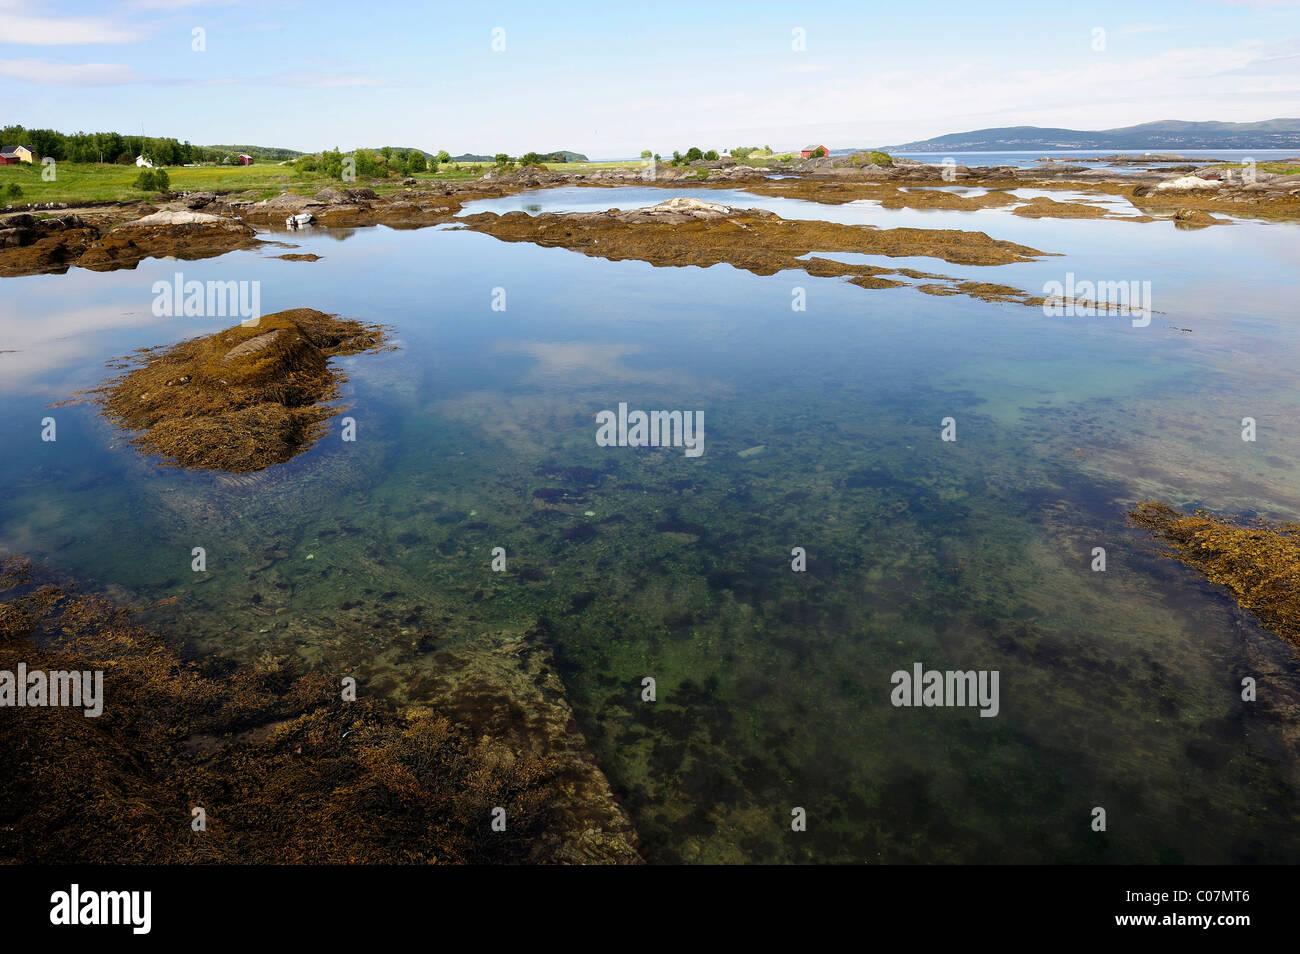 On the RV 17 coast road, Northern Norway, Norway, Scandinavia, Europe - Stock Image